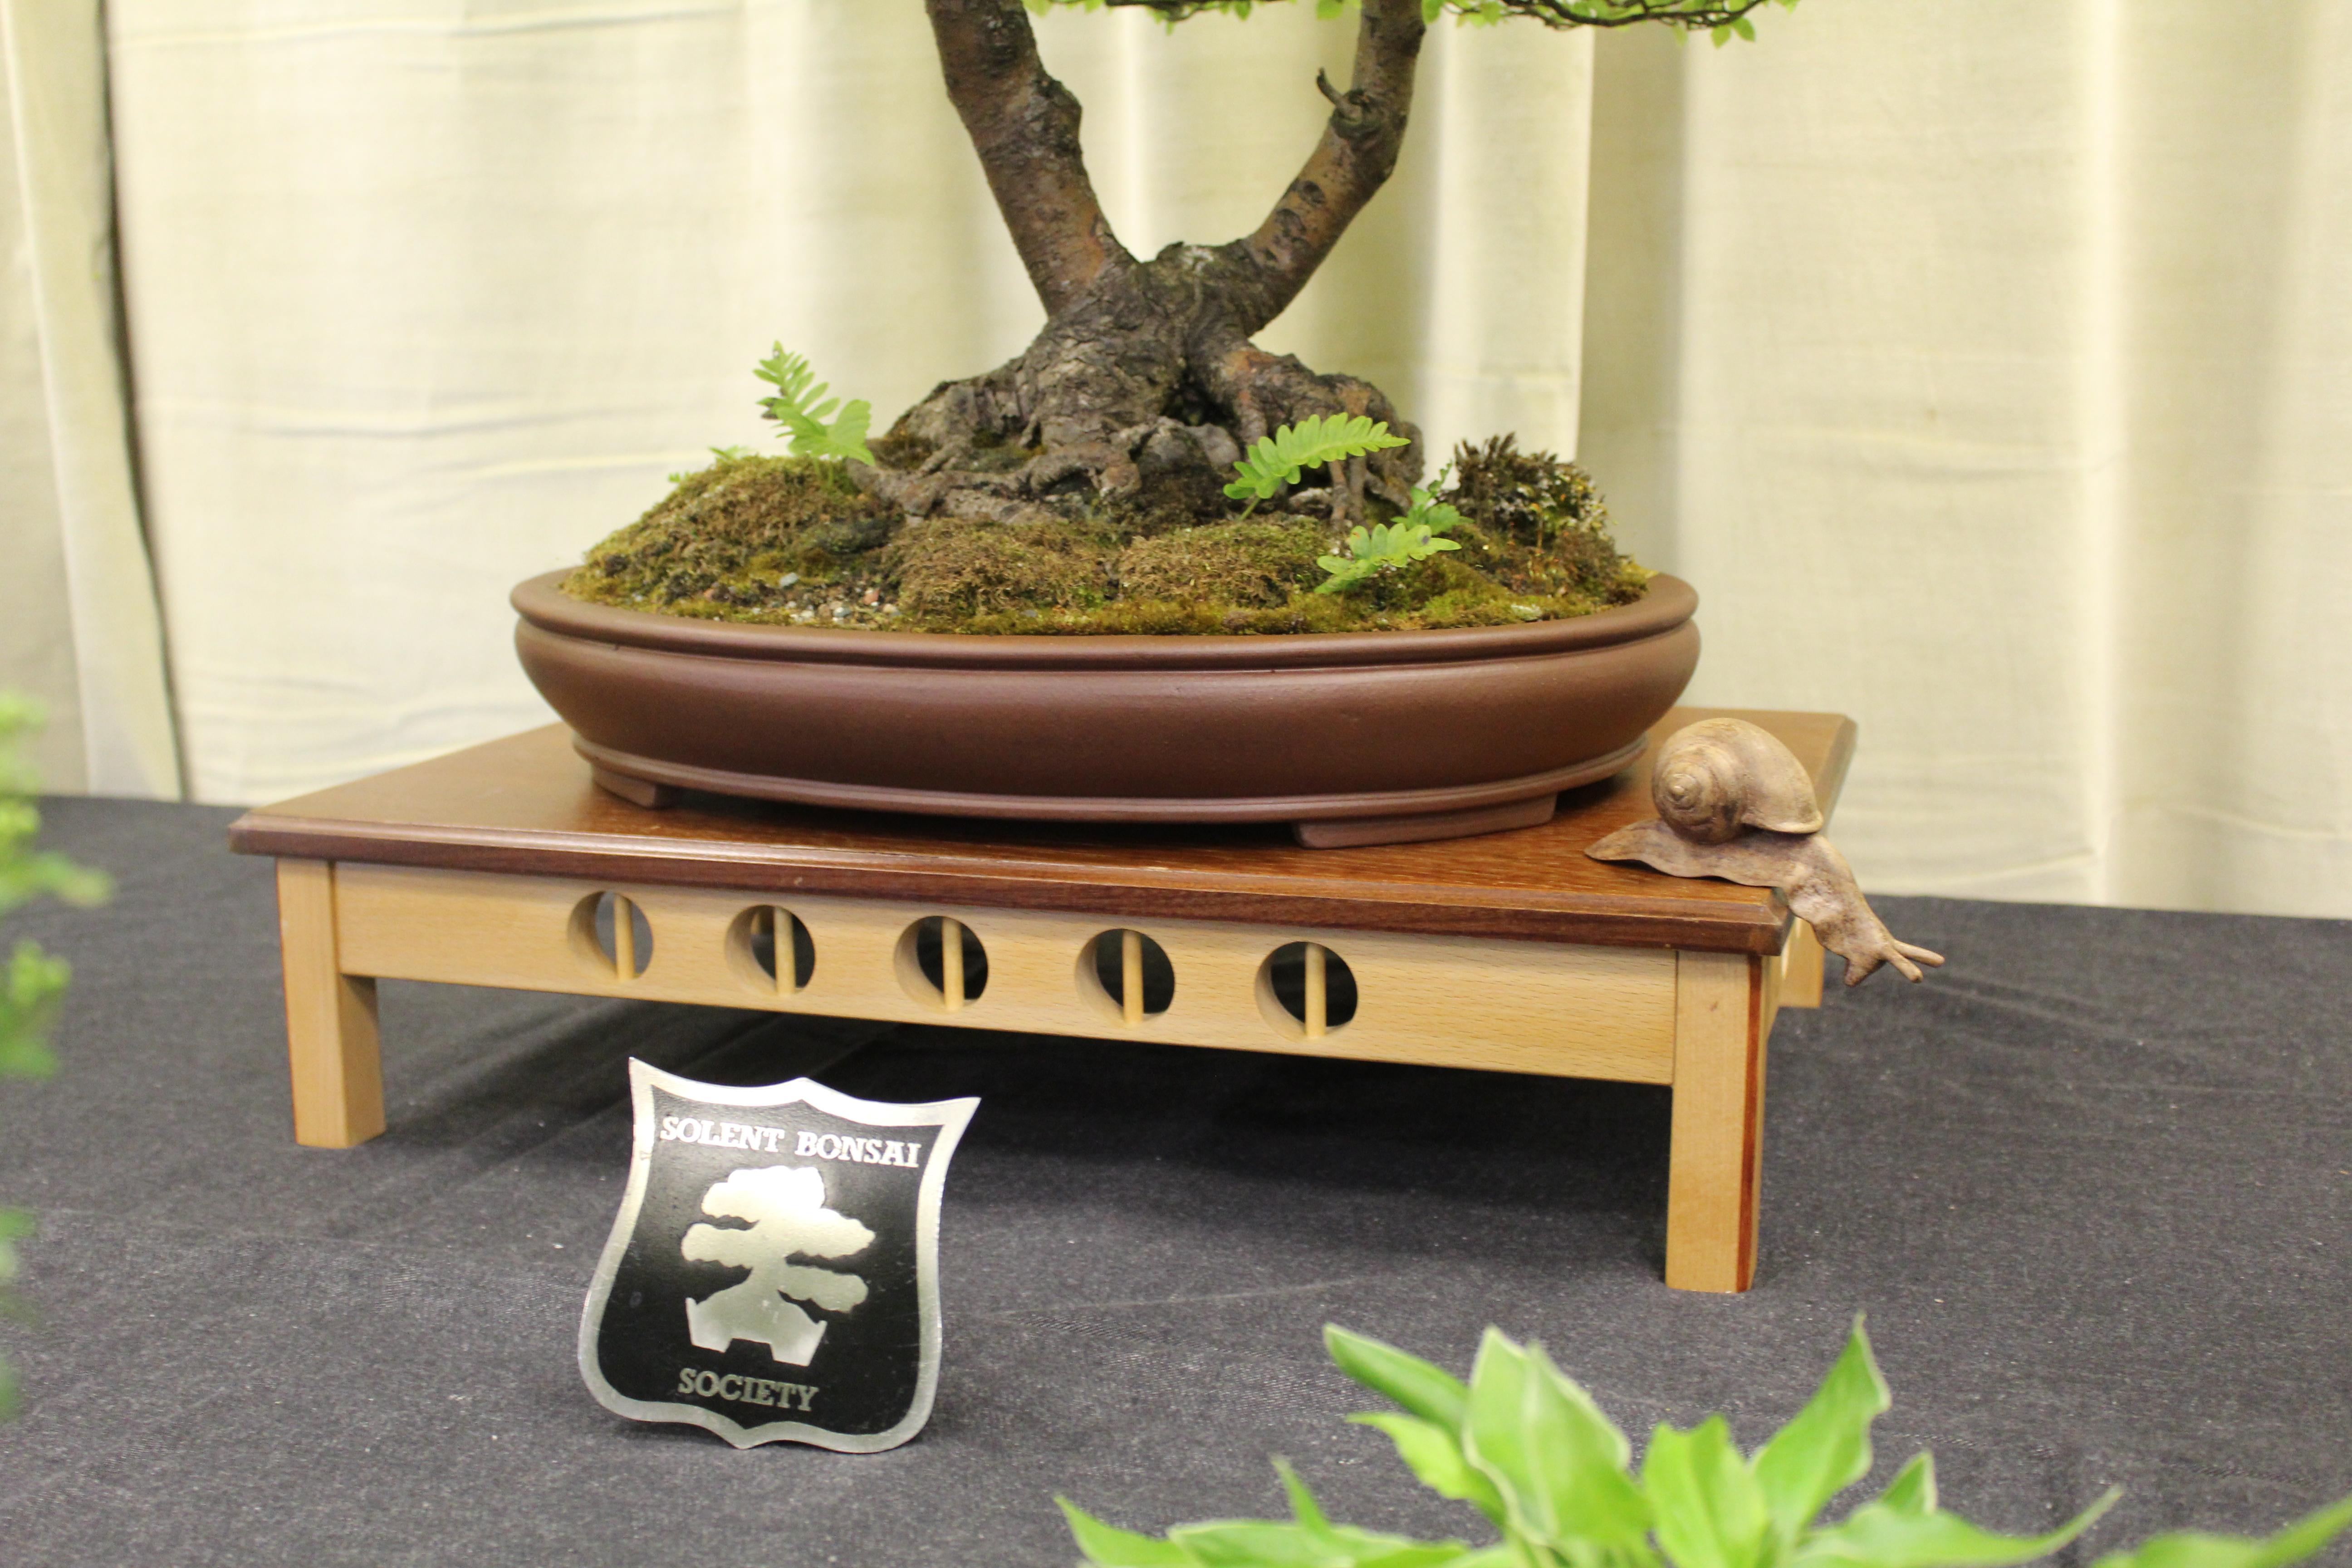 solent bonsai